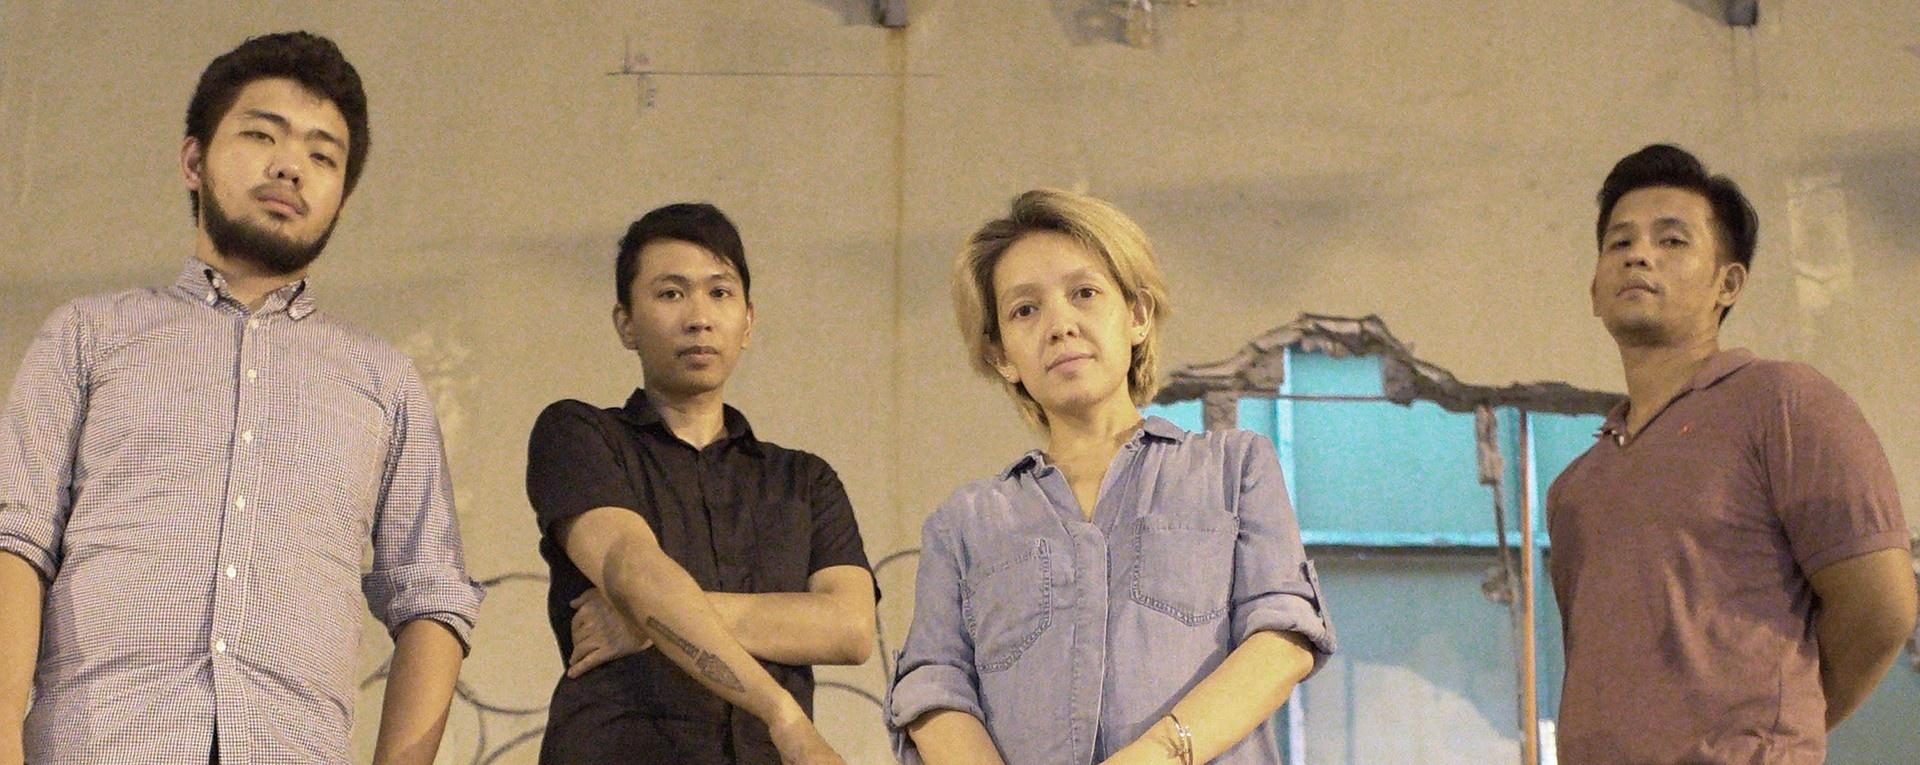 Terno Inferno: Lenses 'Sequence' Album Launch